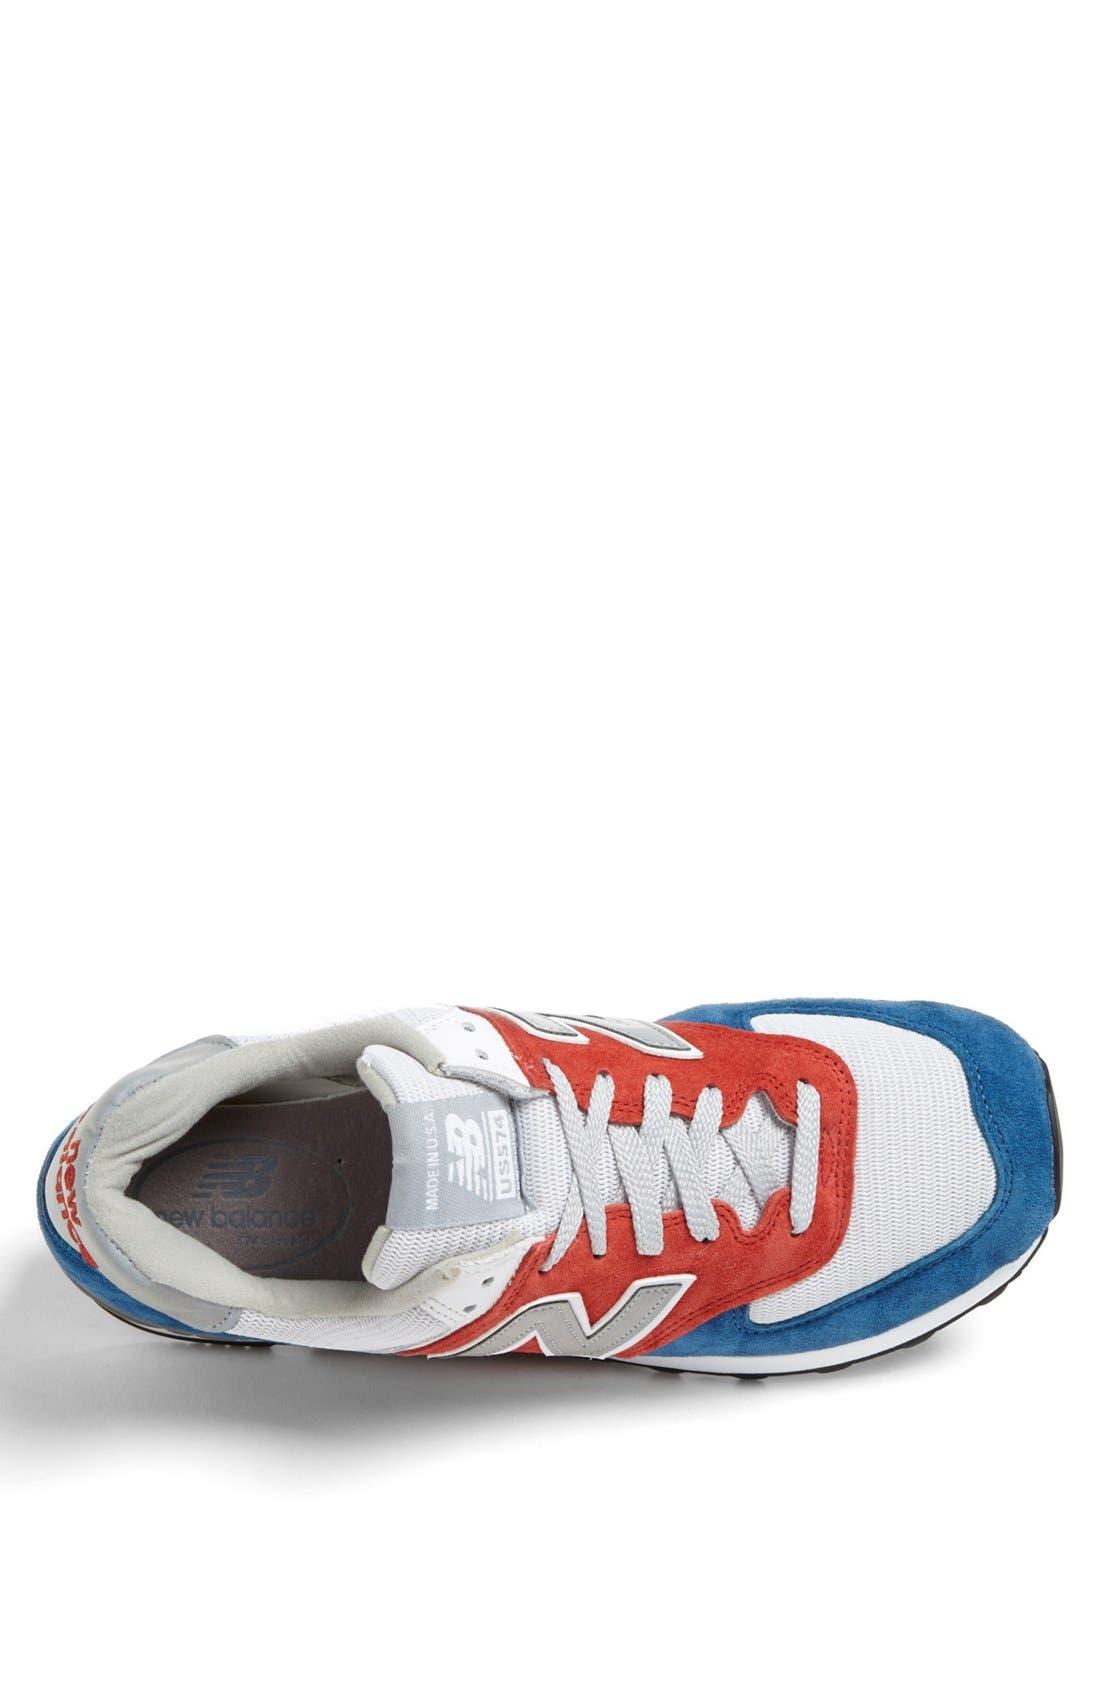 NEW BALANCE, '574' Sneaker, Alternate thumbnail 2, color, 030